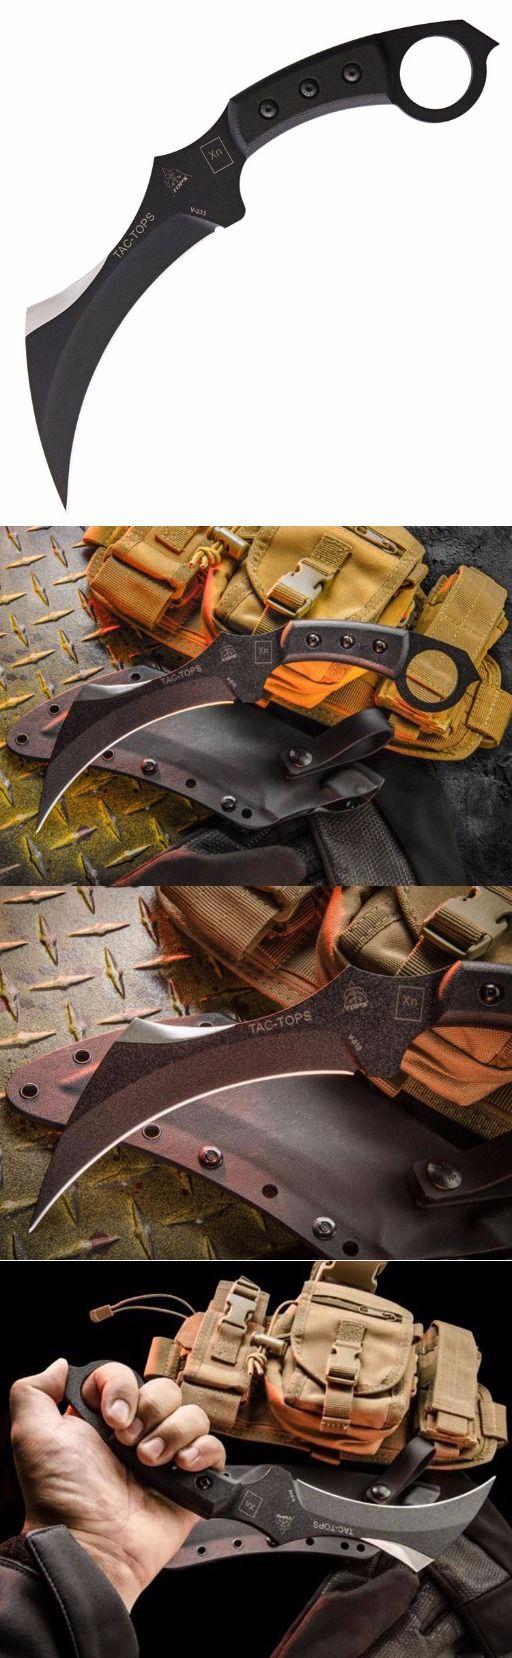 TOPS Knives TAC-TOPS Karambit Fixed Knife